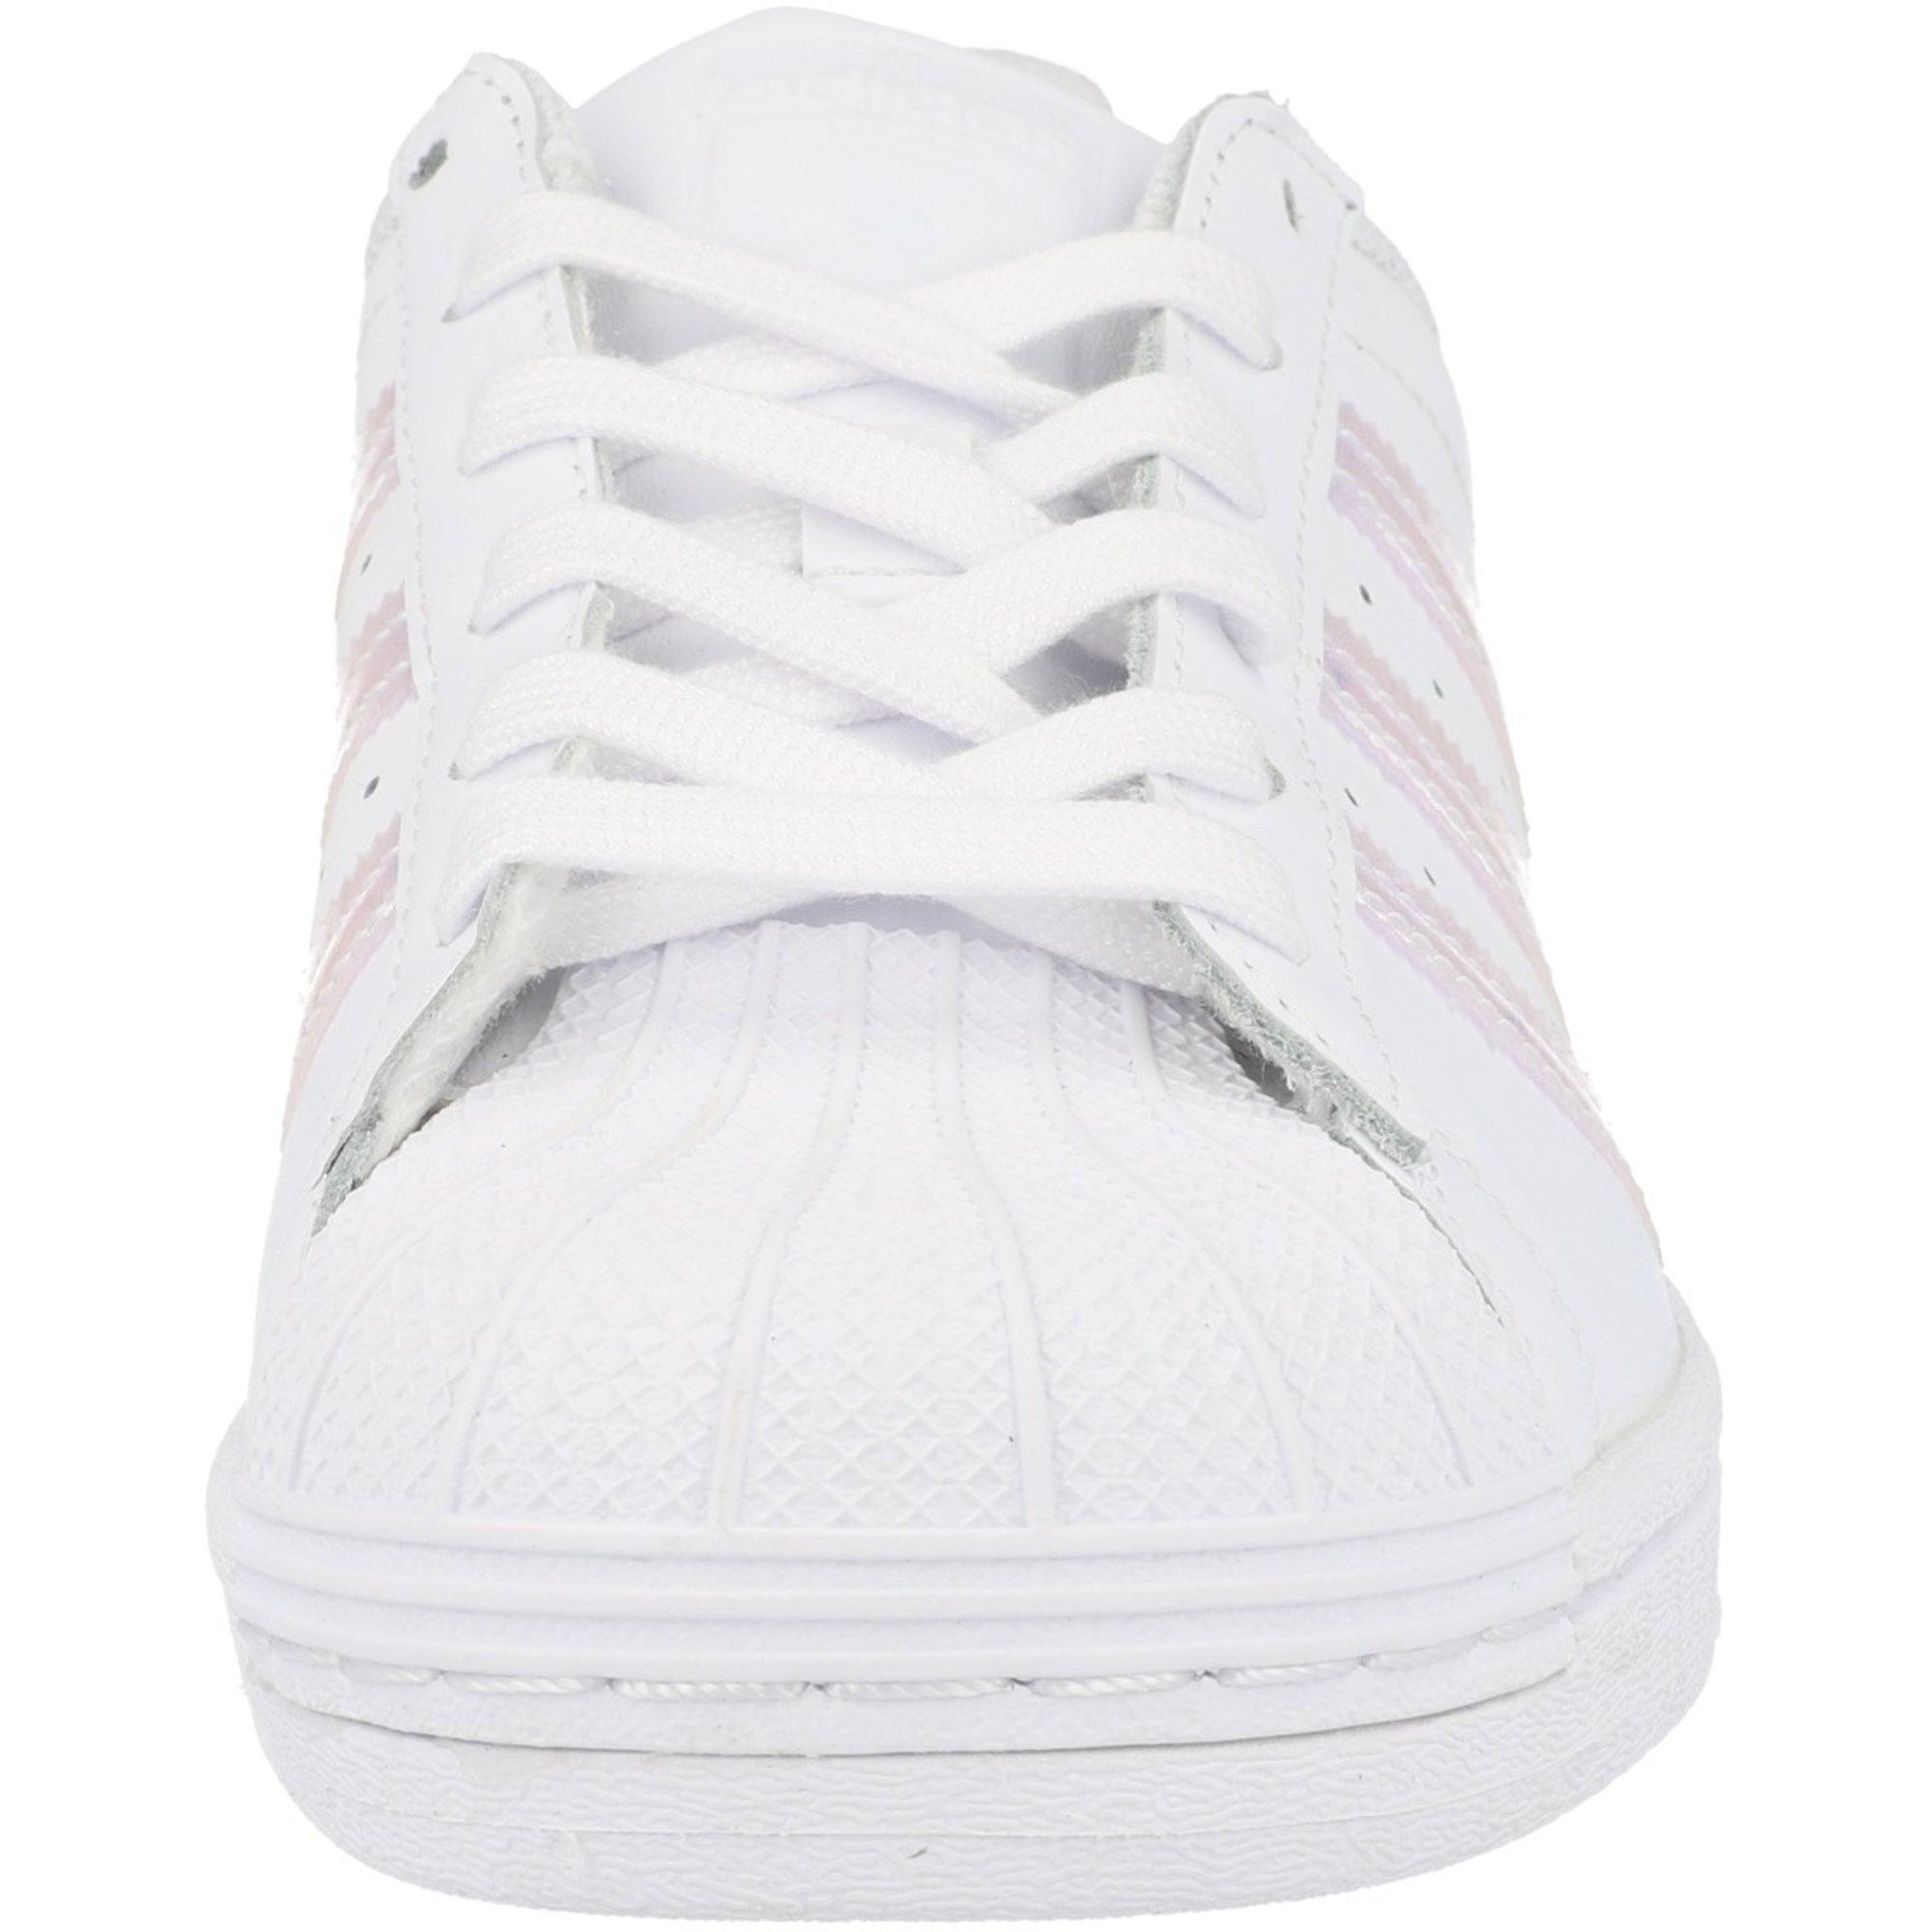 adidas Originals Superstar J White Leather